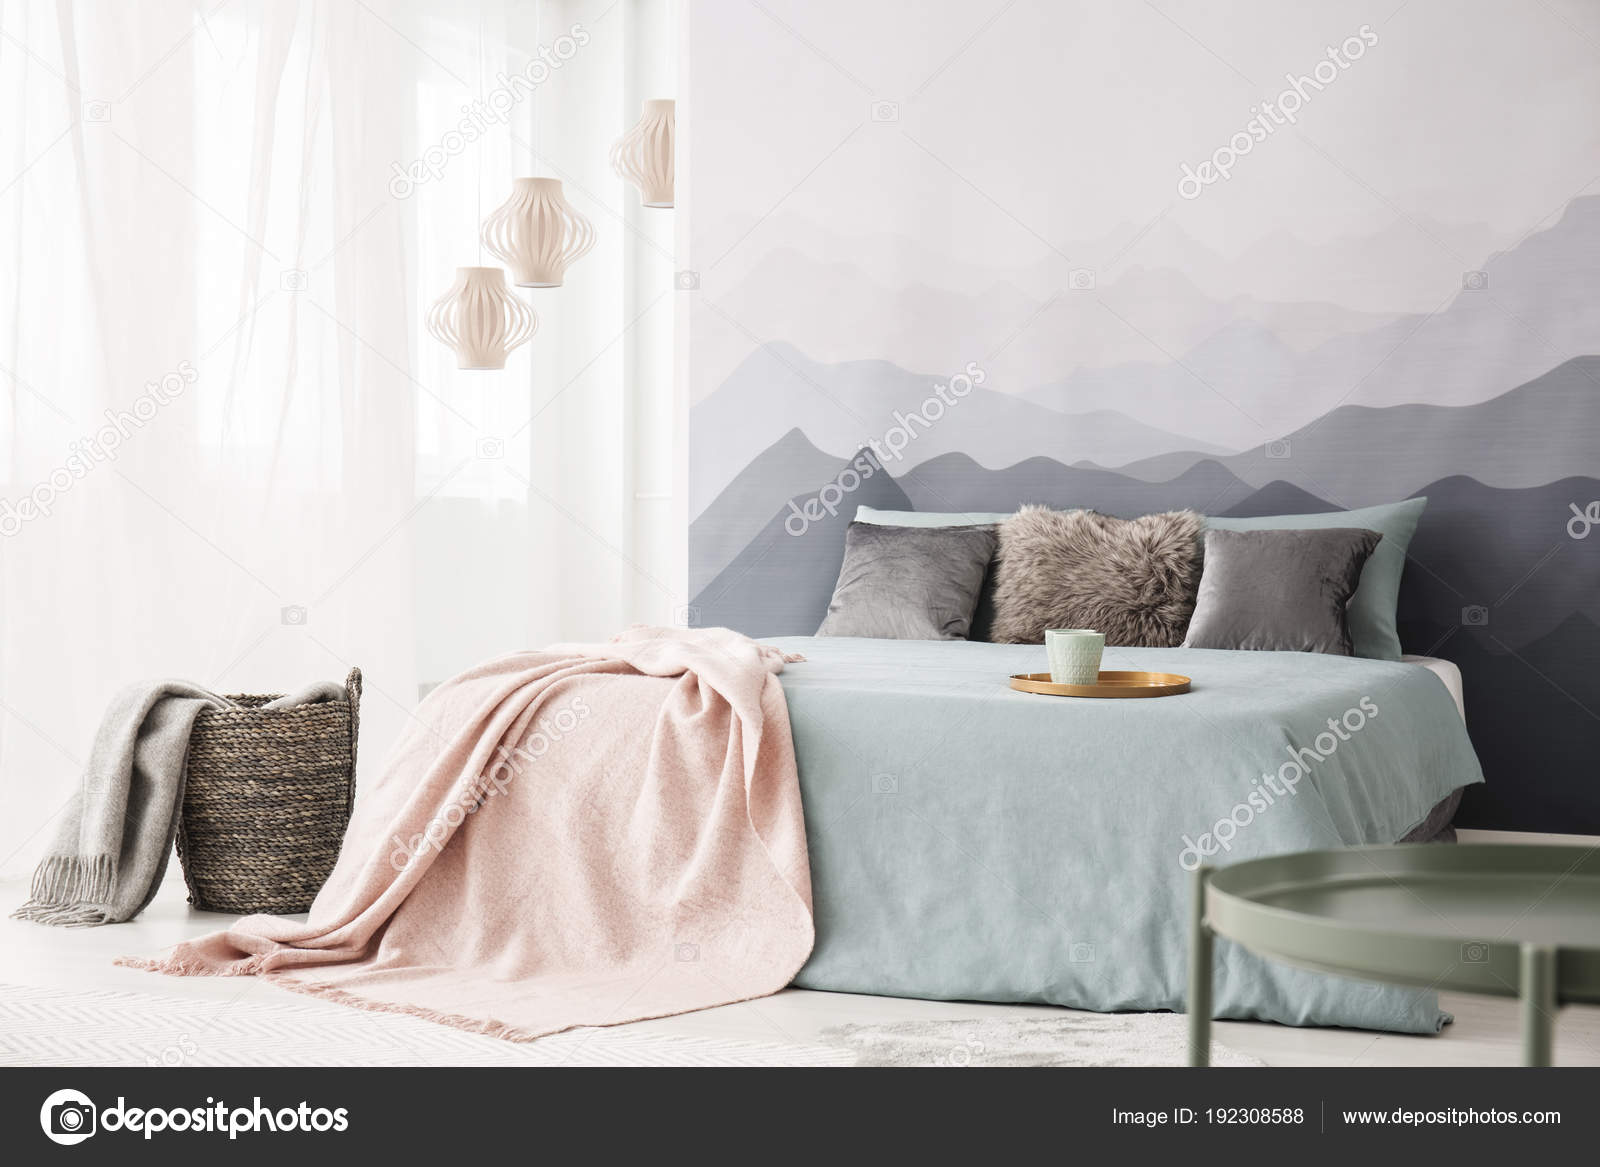 pastel slaapkamer interieur met berg stockfoto